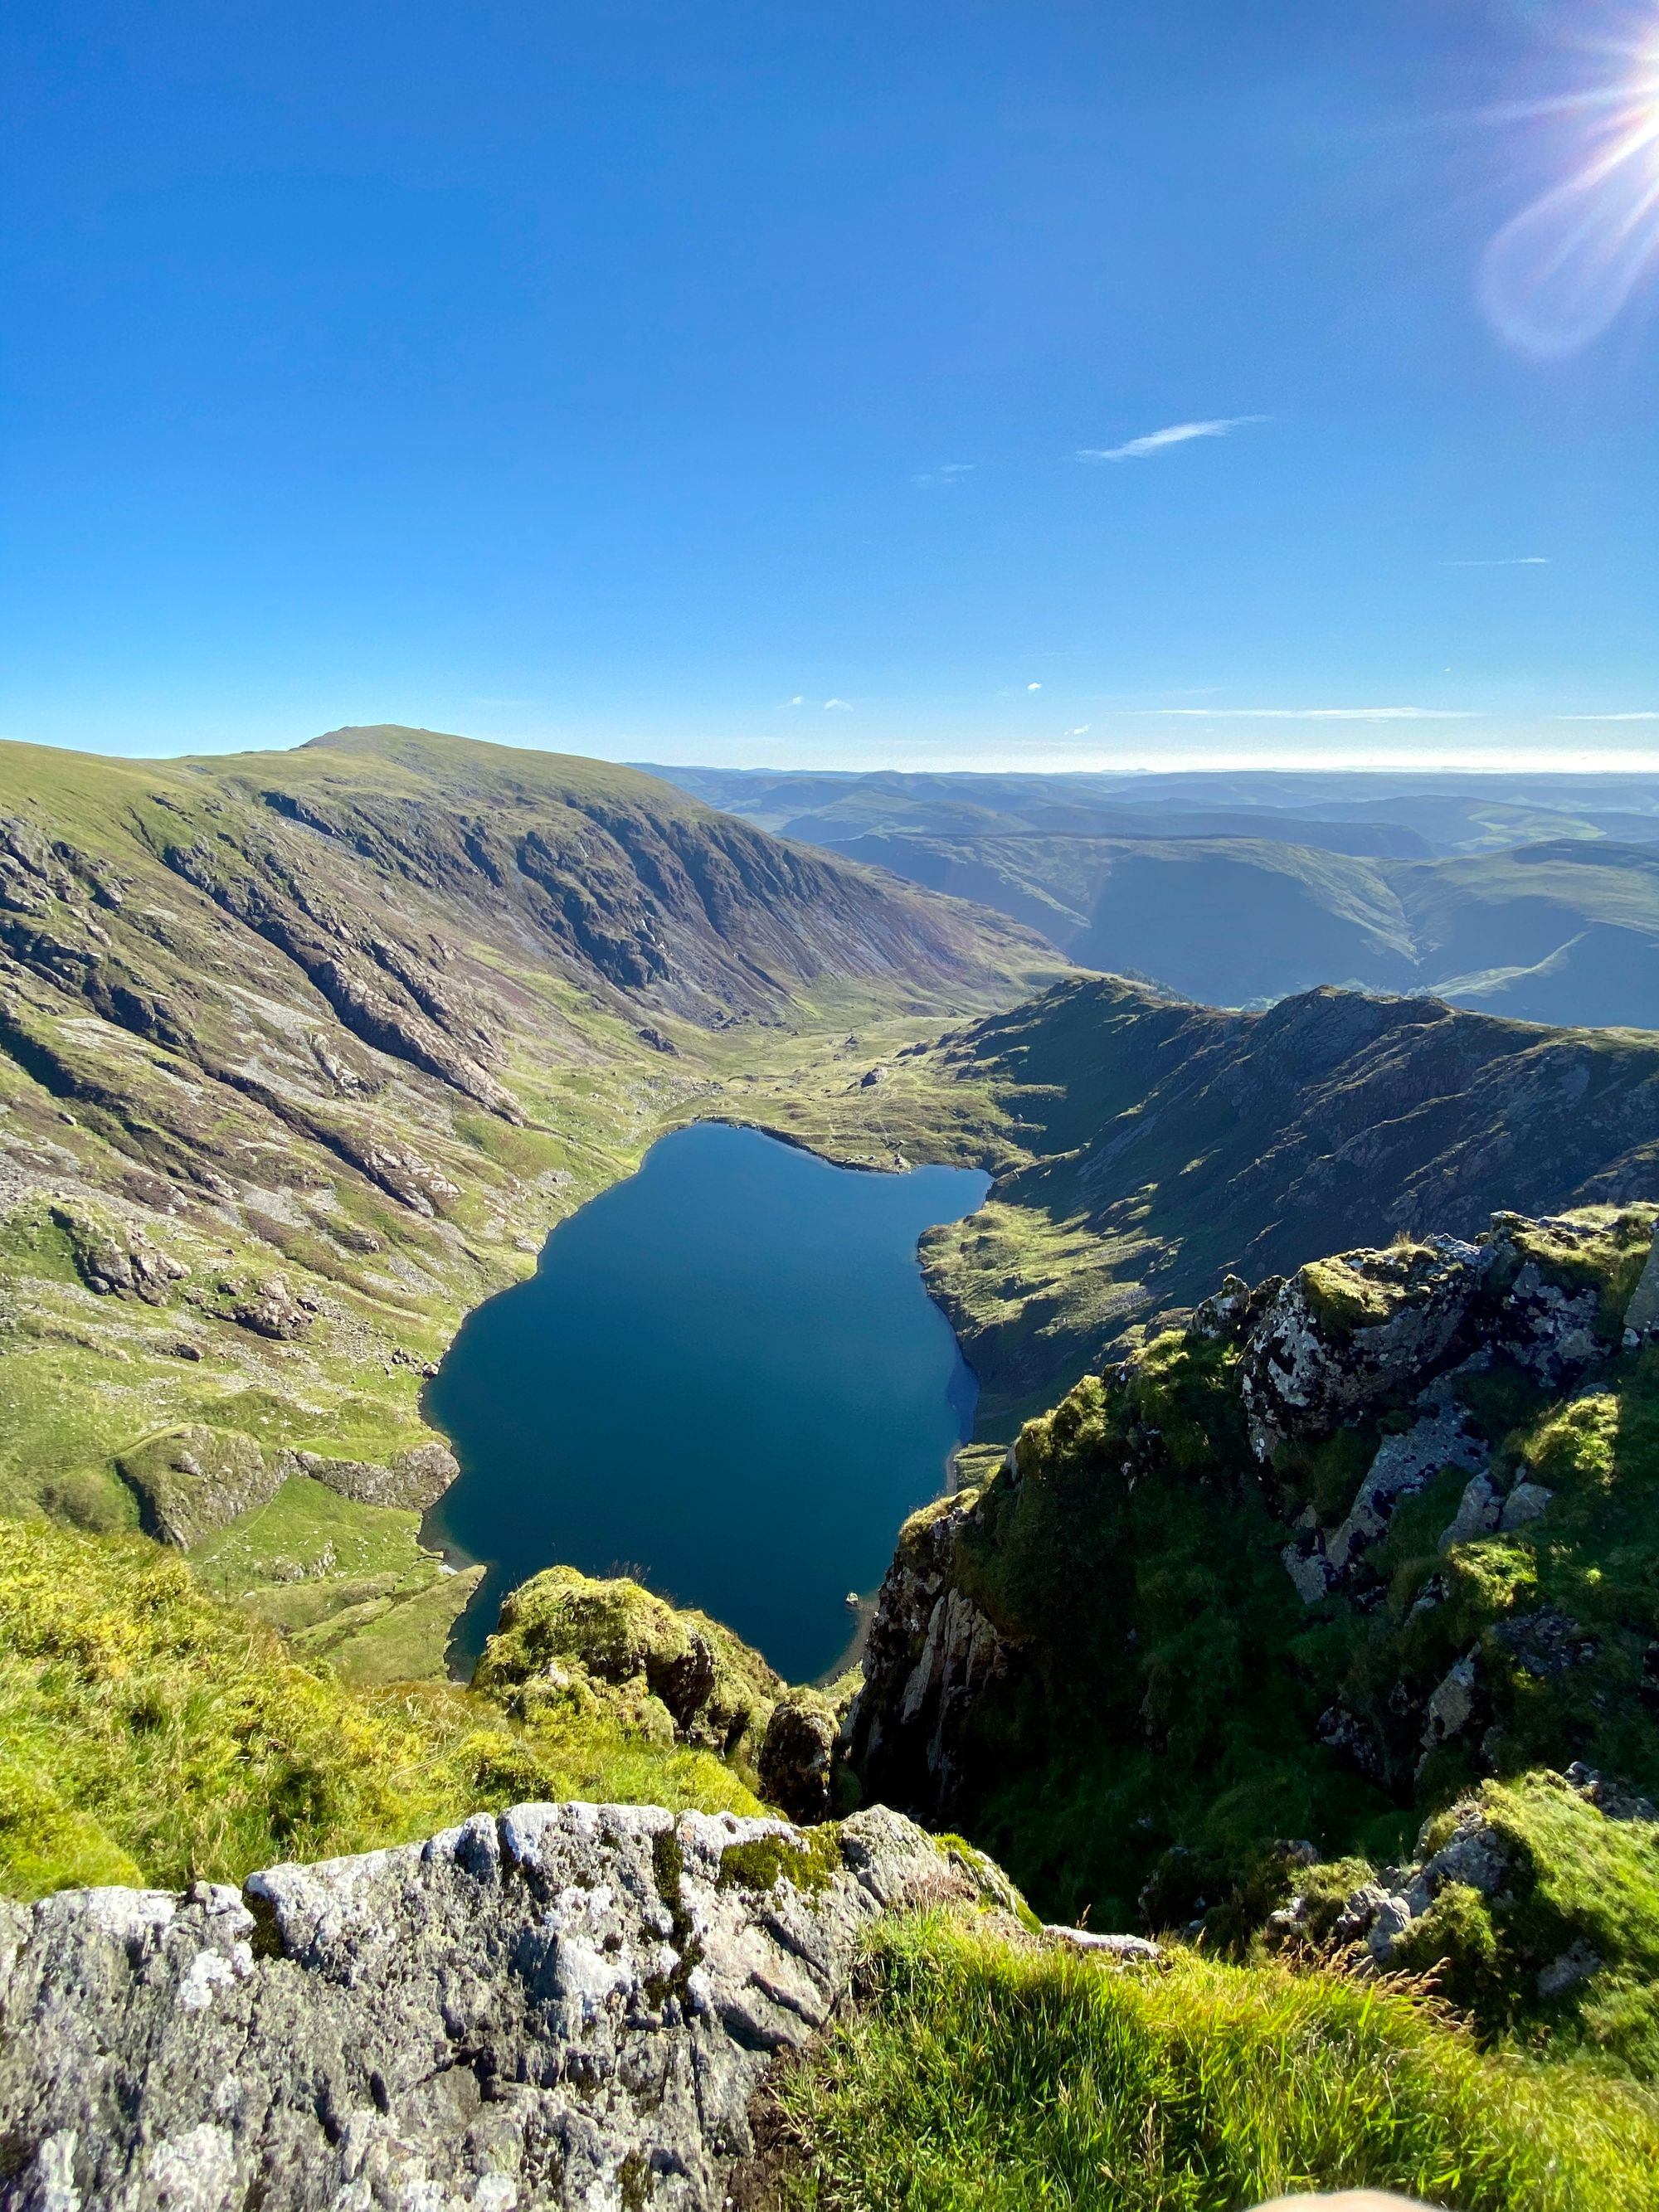 Cadair Idris mountain in North Wales, Snowdonia